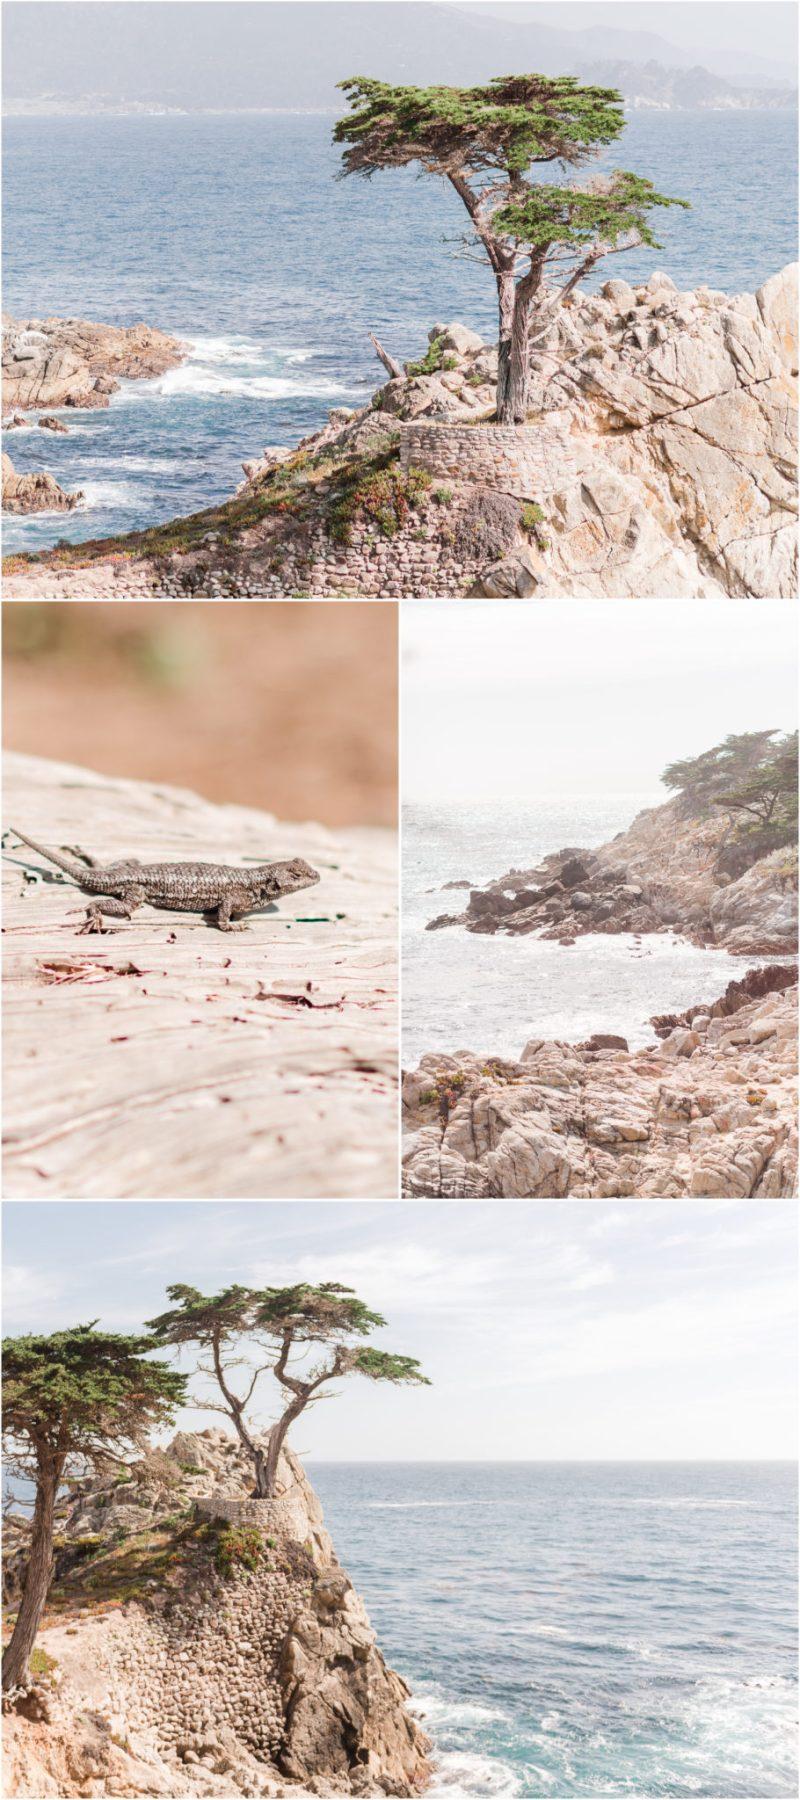 The Lone Cypress 17-Mile Drive Pebble Beach California